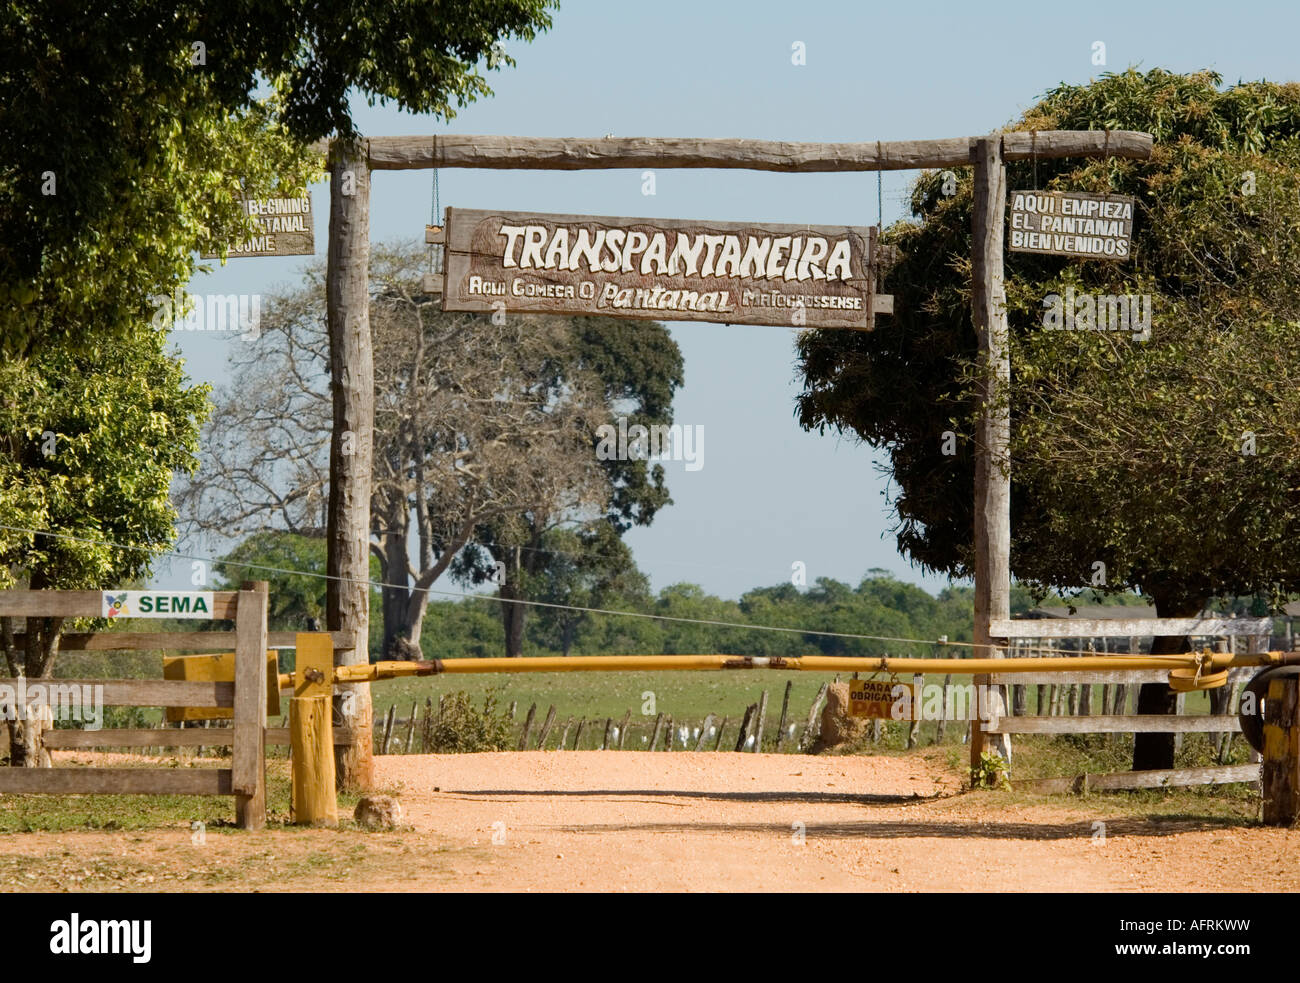 35430c359 Entrance to the Transpantaneira Northern Pantanal Mato Grosso Brazil -  Stock Image